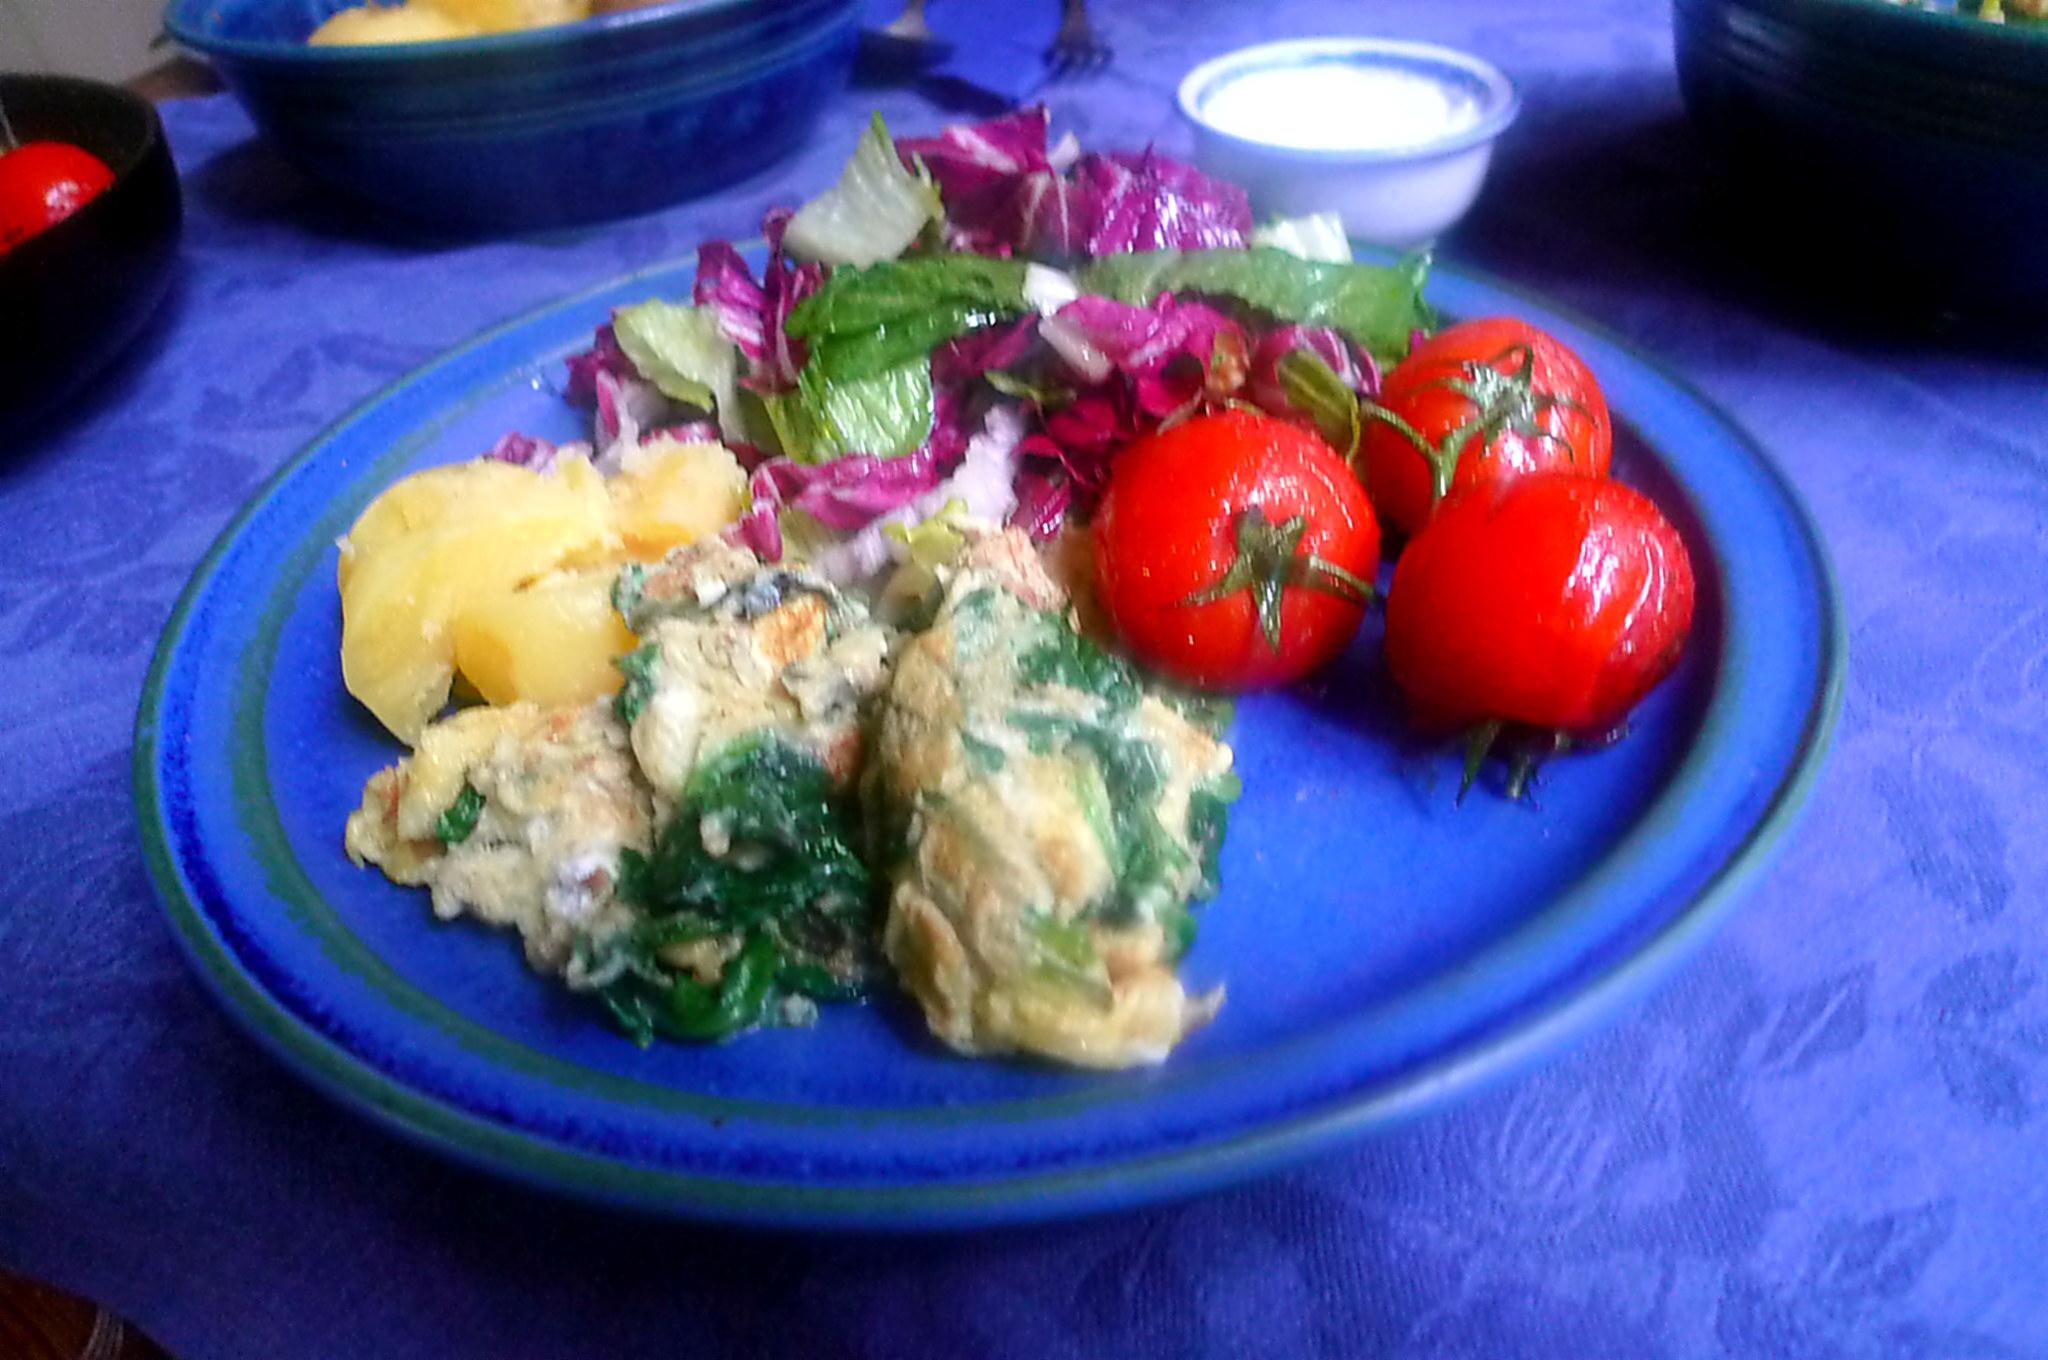 Spinat mit Rührei,Salat,Kartoffel,gebratene Tomaten -- 11.9.14   (12)